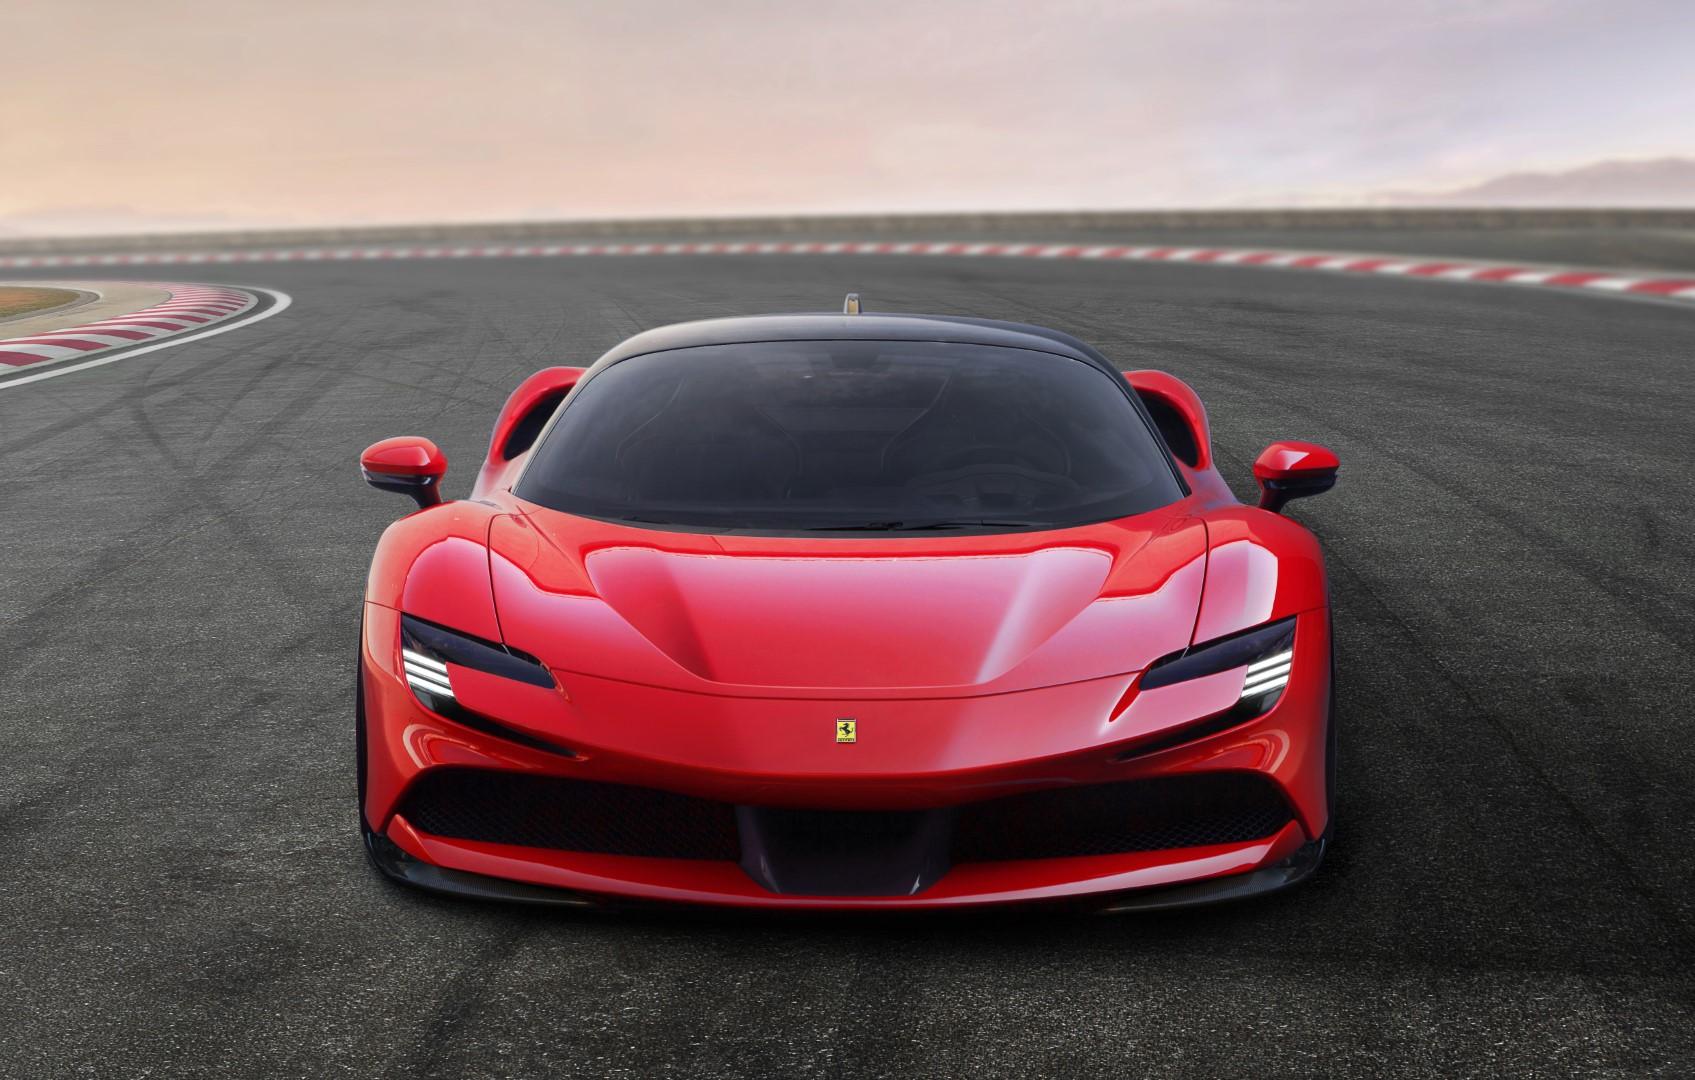 Making supercars for women 'a mistake': Ferrari - Arabianbusiness